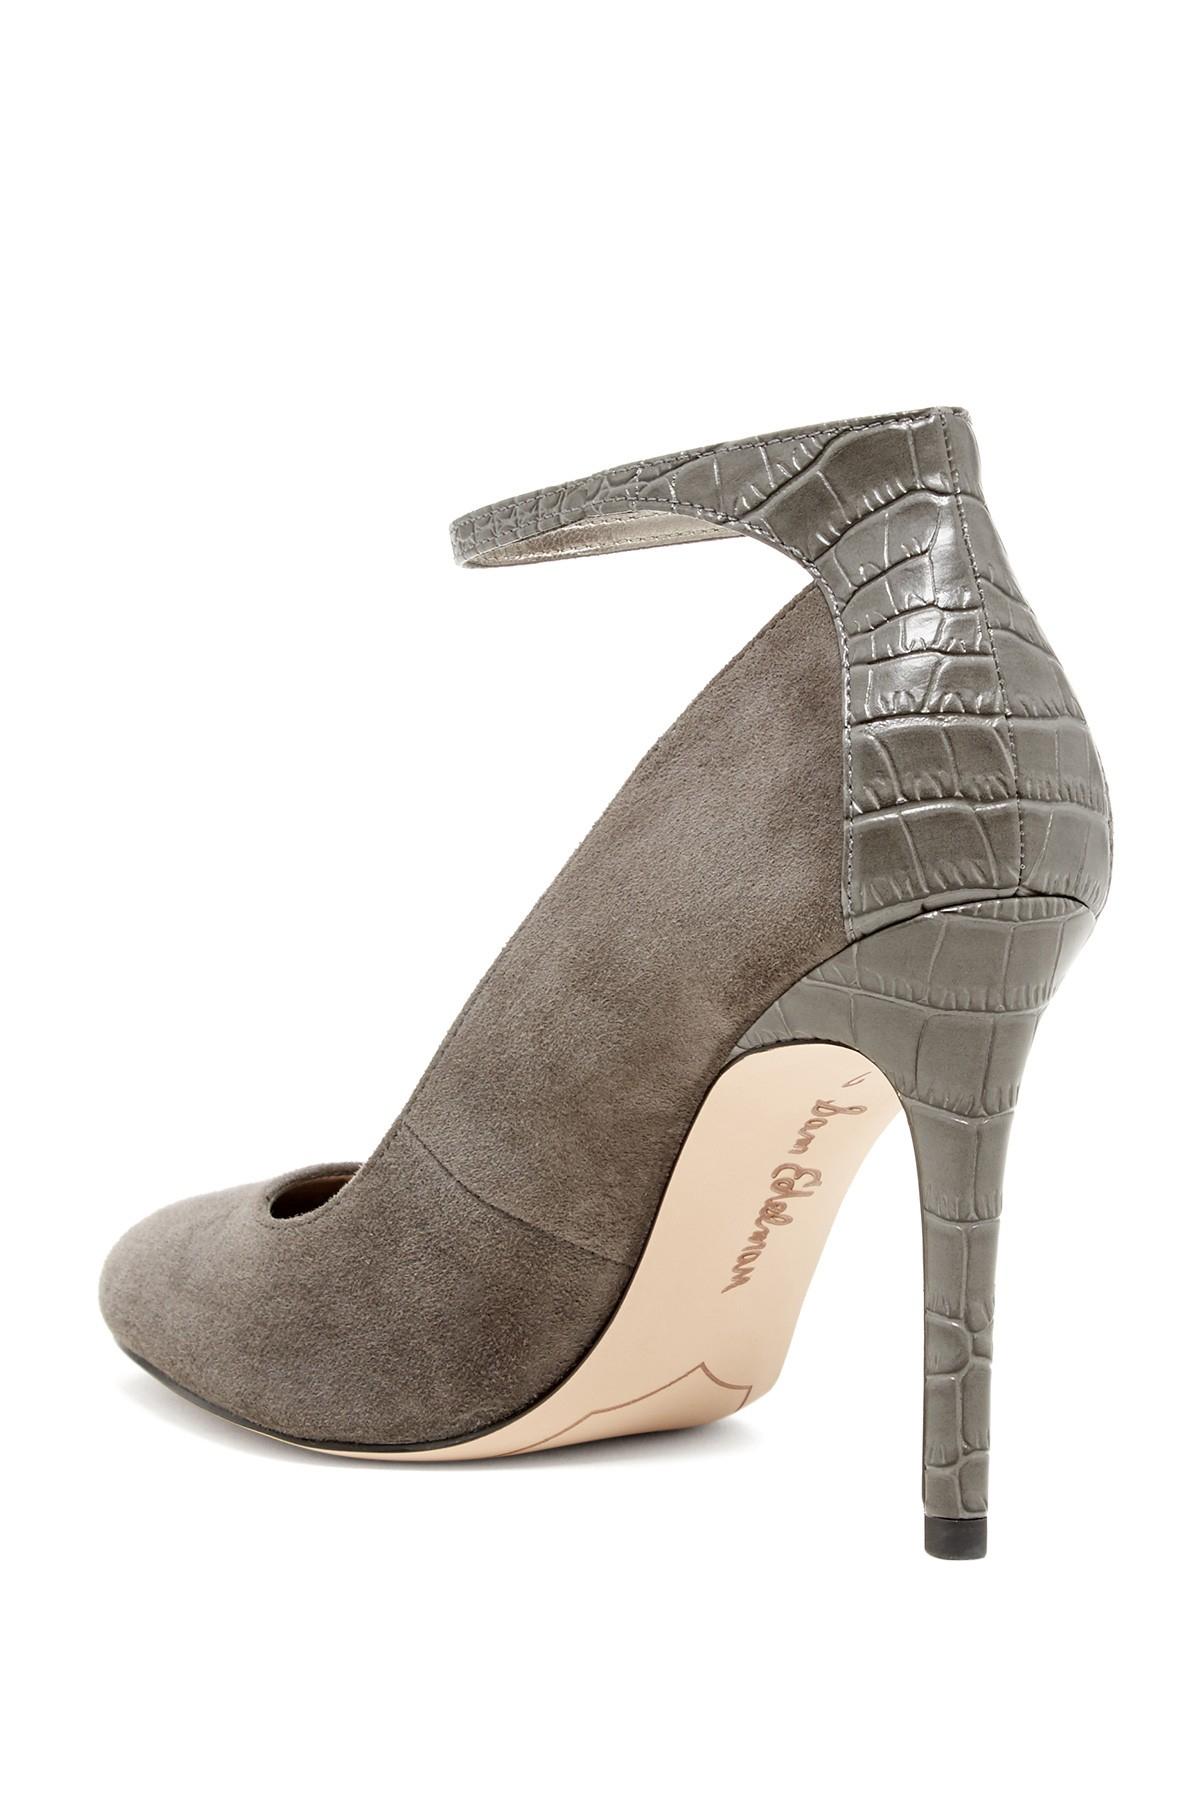 Sam Edelman Shoes Canada